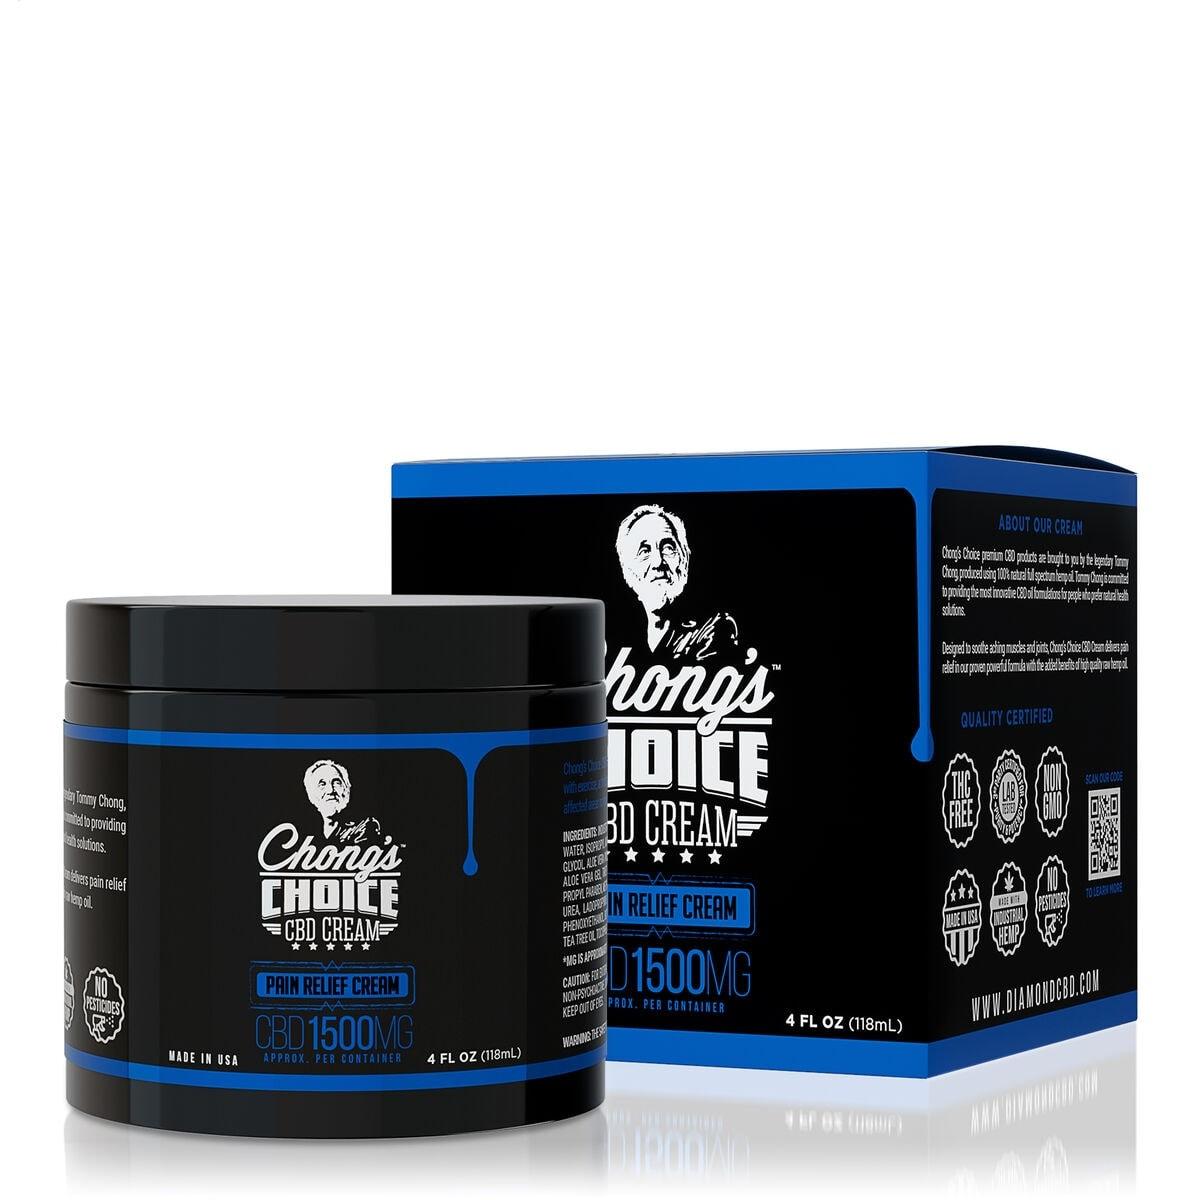 Chong's Choice, CBD Cream, Pain Relief, Broad Spectrum THC-Free, 4oz, 1500mg CBD